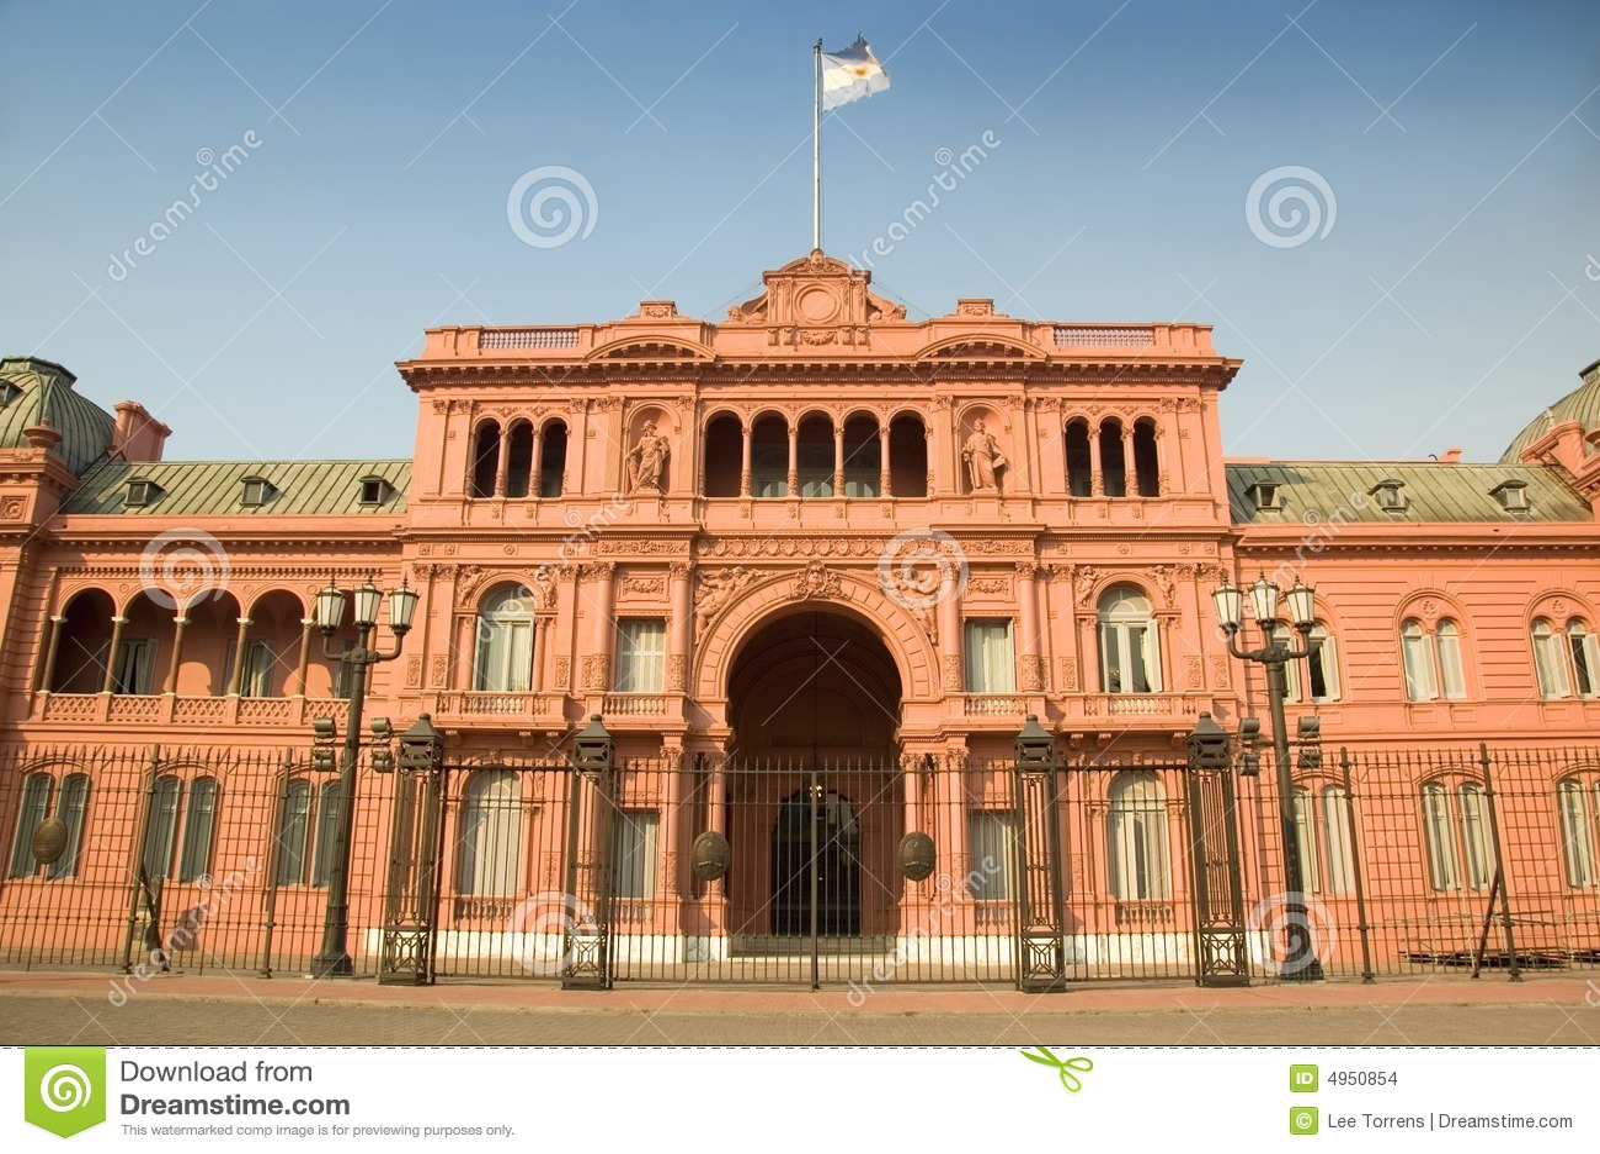 Casa rosada buenos aires argentina stock photo image for Casa argentina